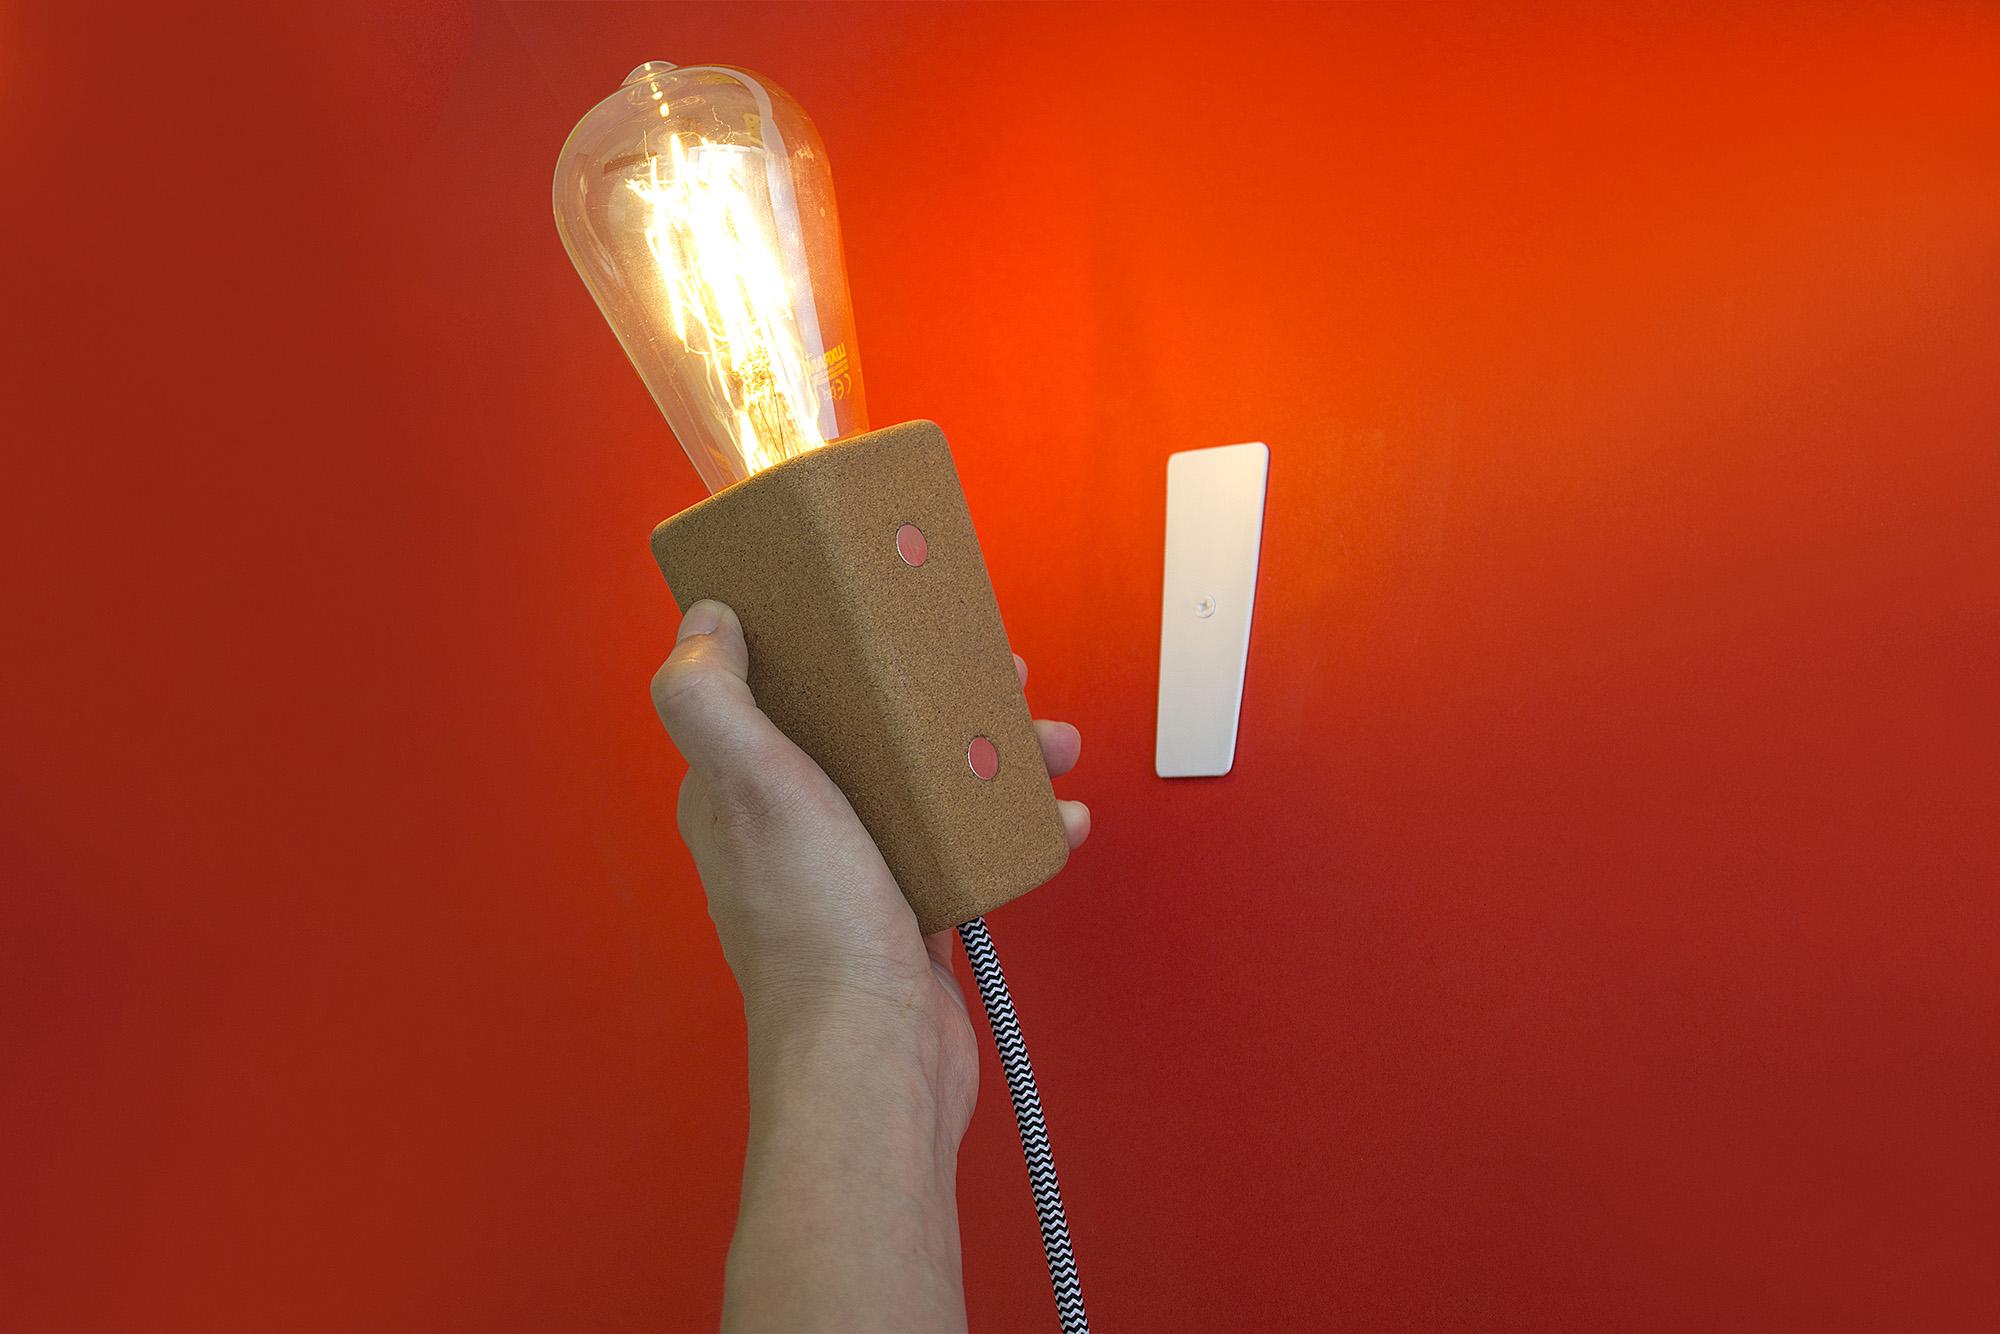 low-Galula-magneto-lamp-amb-14.jpg